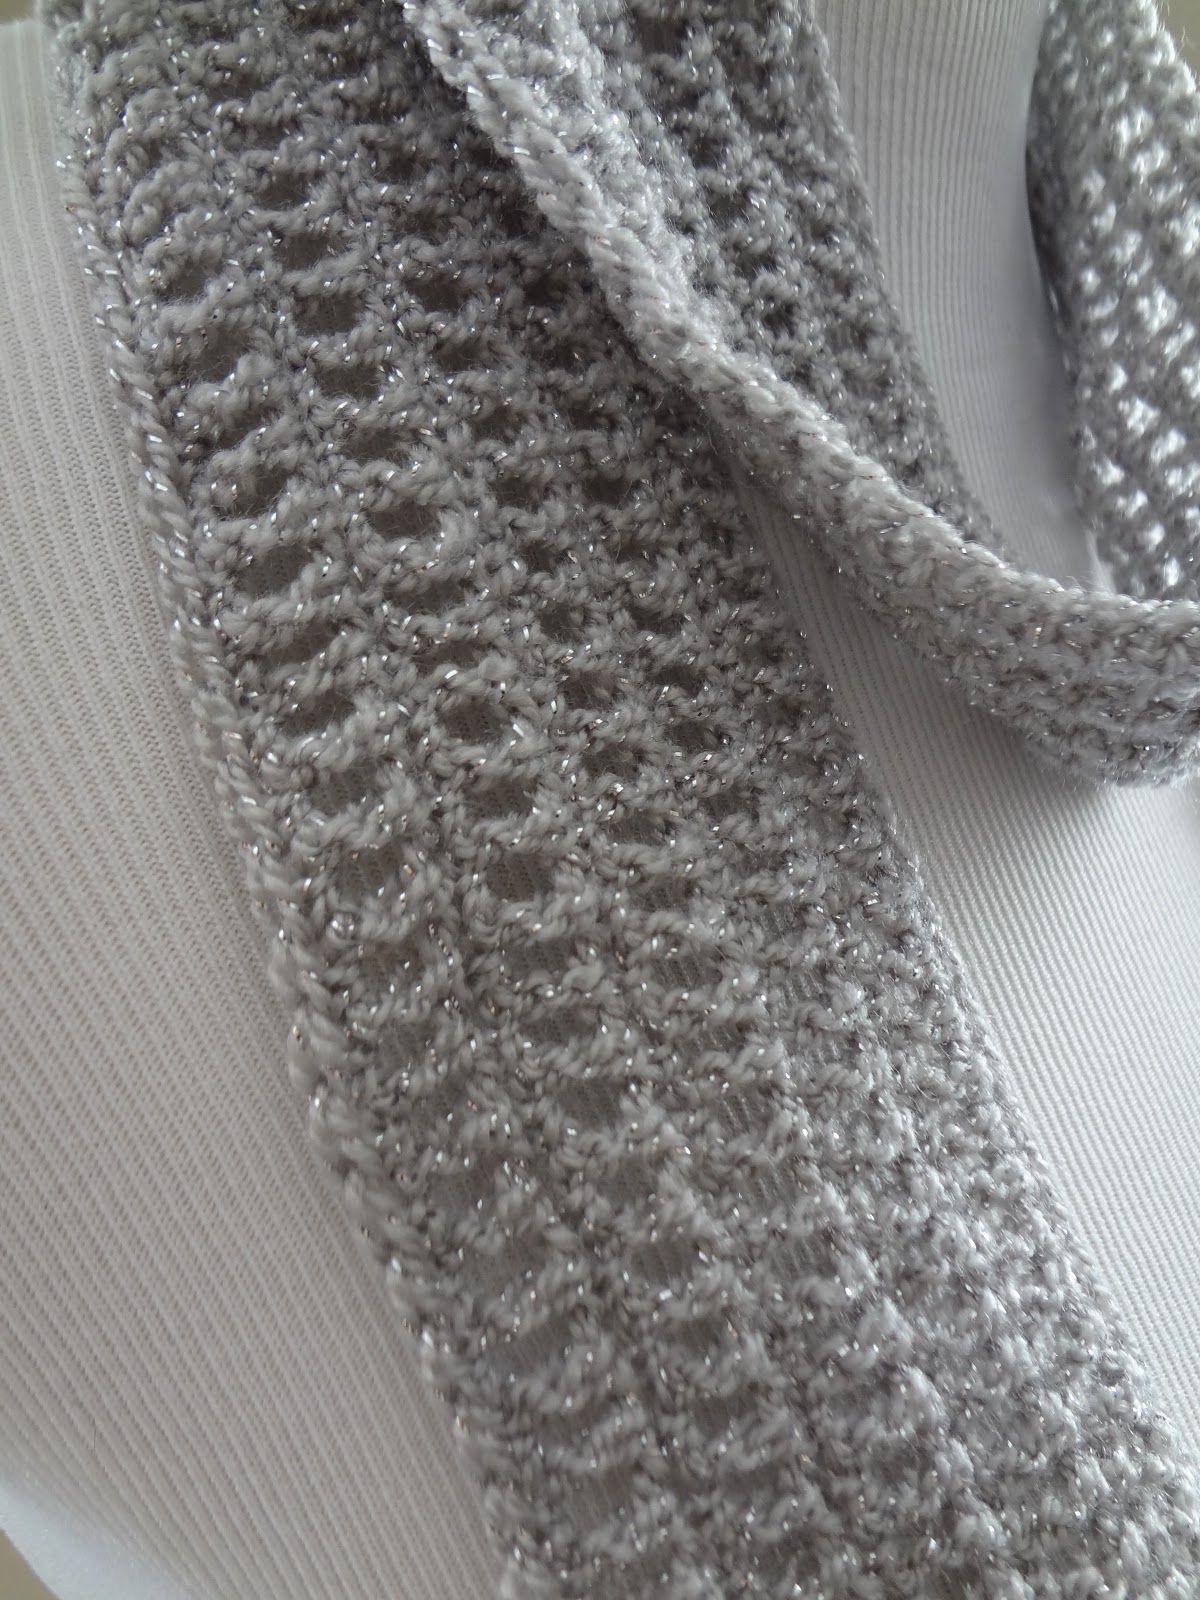 Free crochet infinity scarf pattern in stitching free free crochet infinity scarf pattern in stitching free crochet pattern bankloansurffo Choice Image